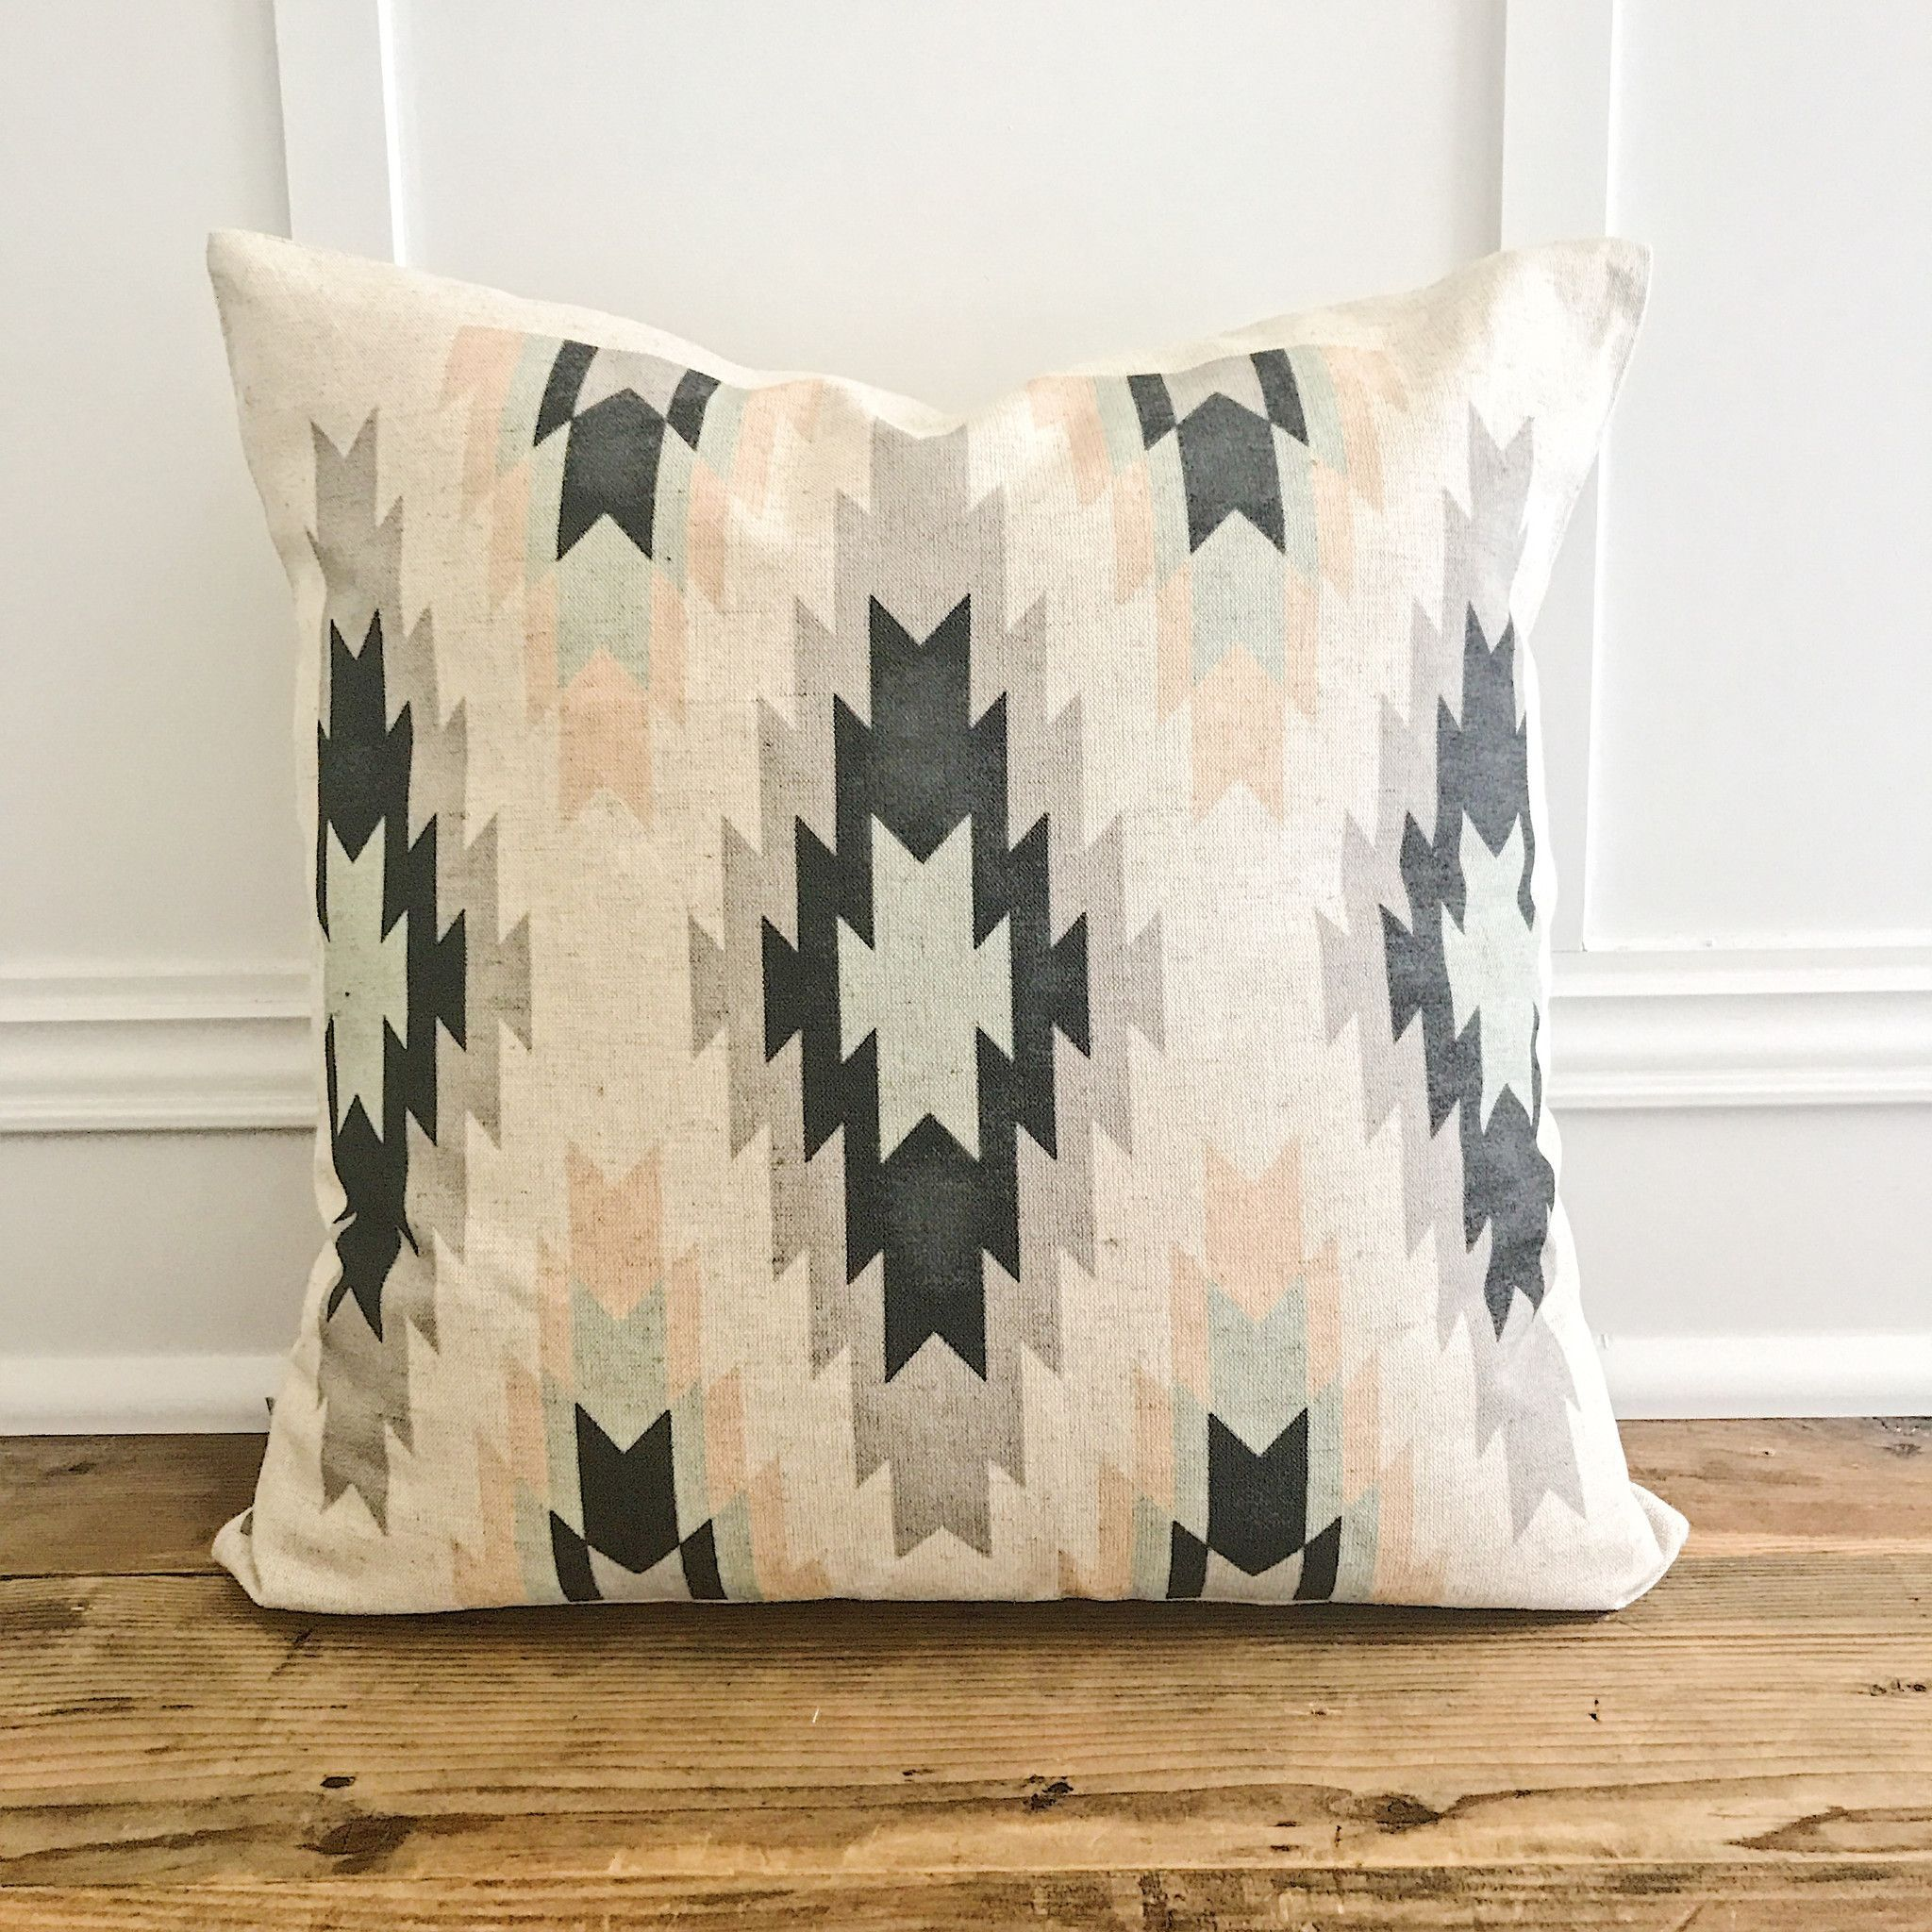 Aztec Pillow Cover (Design 5) in 2020